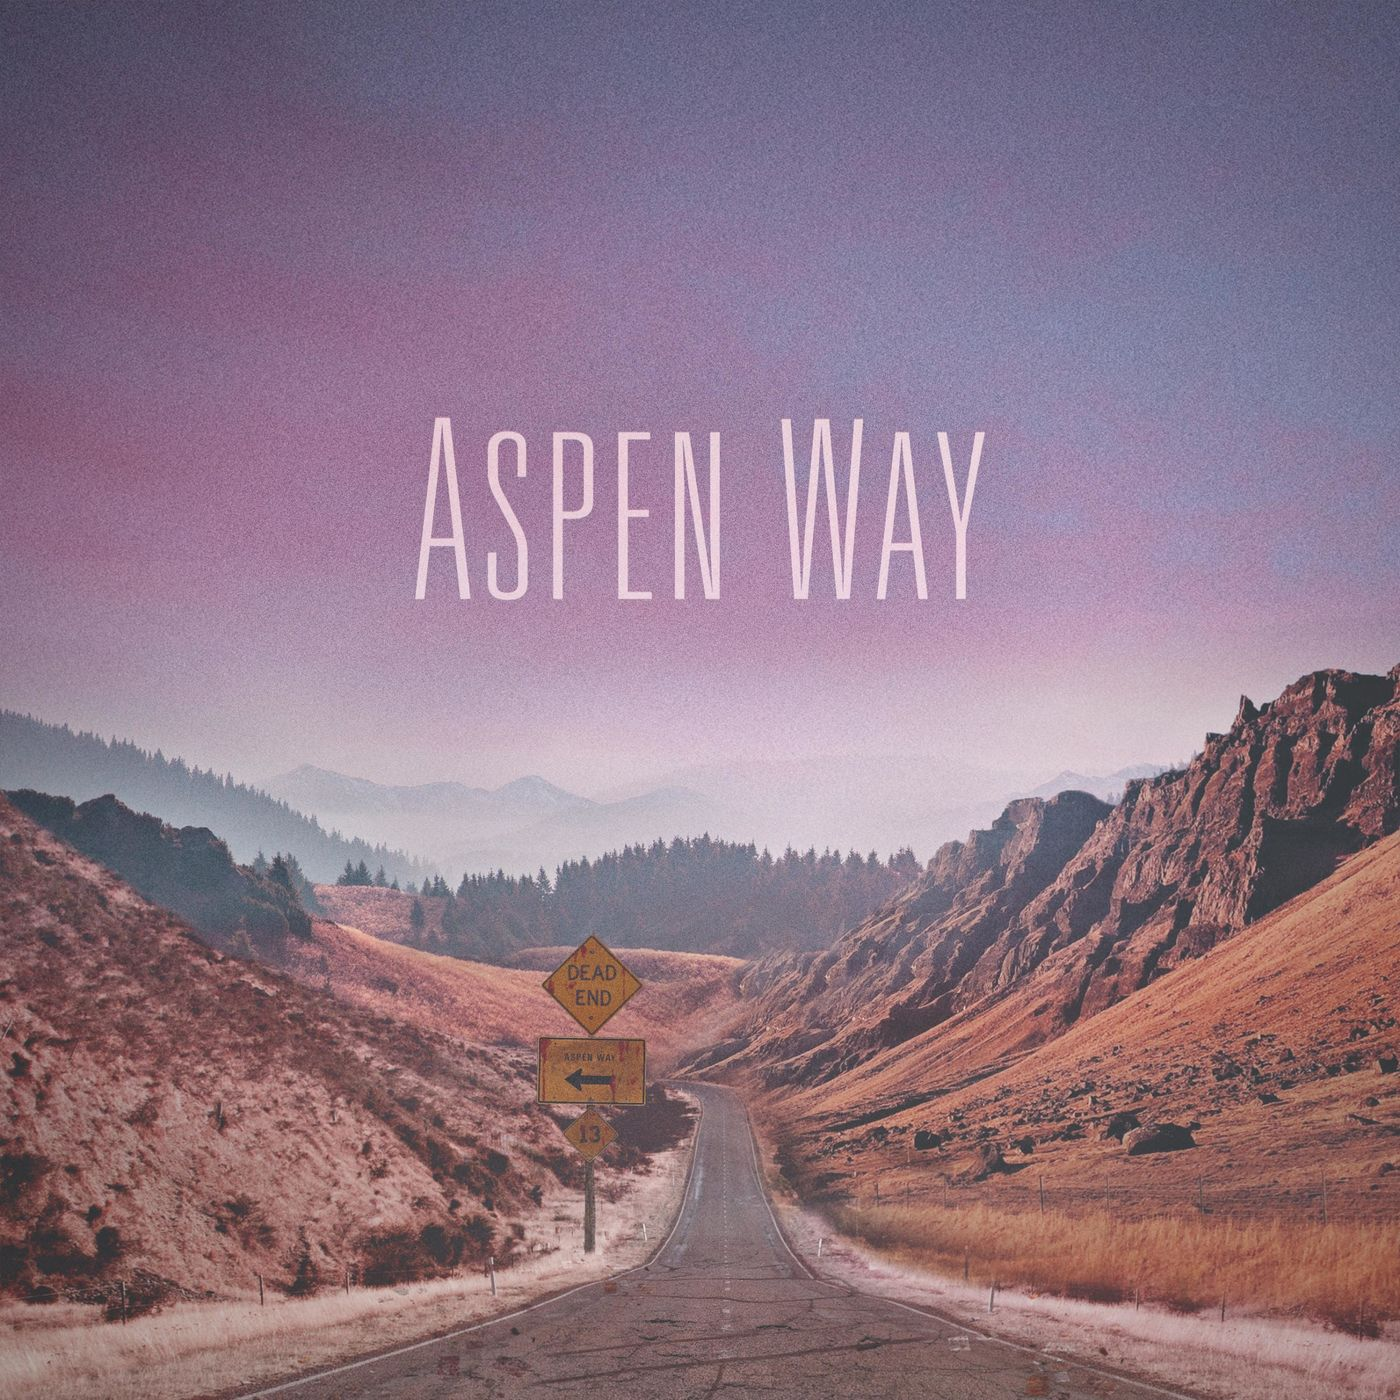 Aspen Way - Aspen Way [EP] (2017)